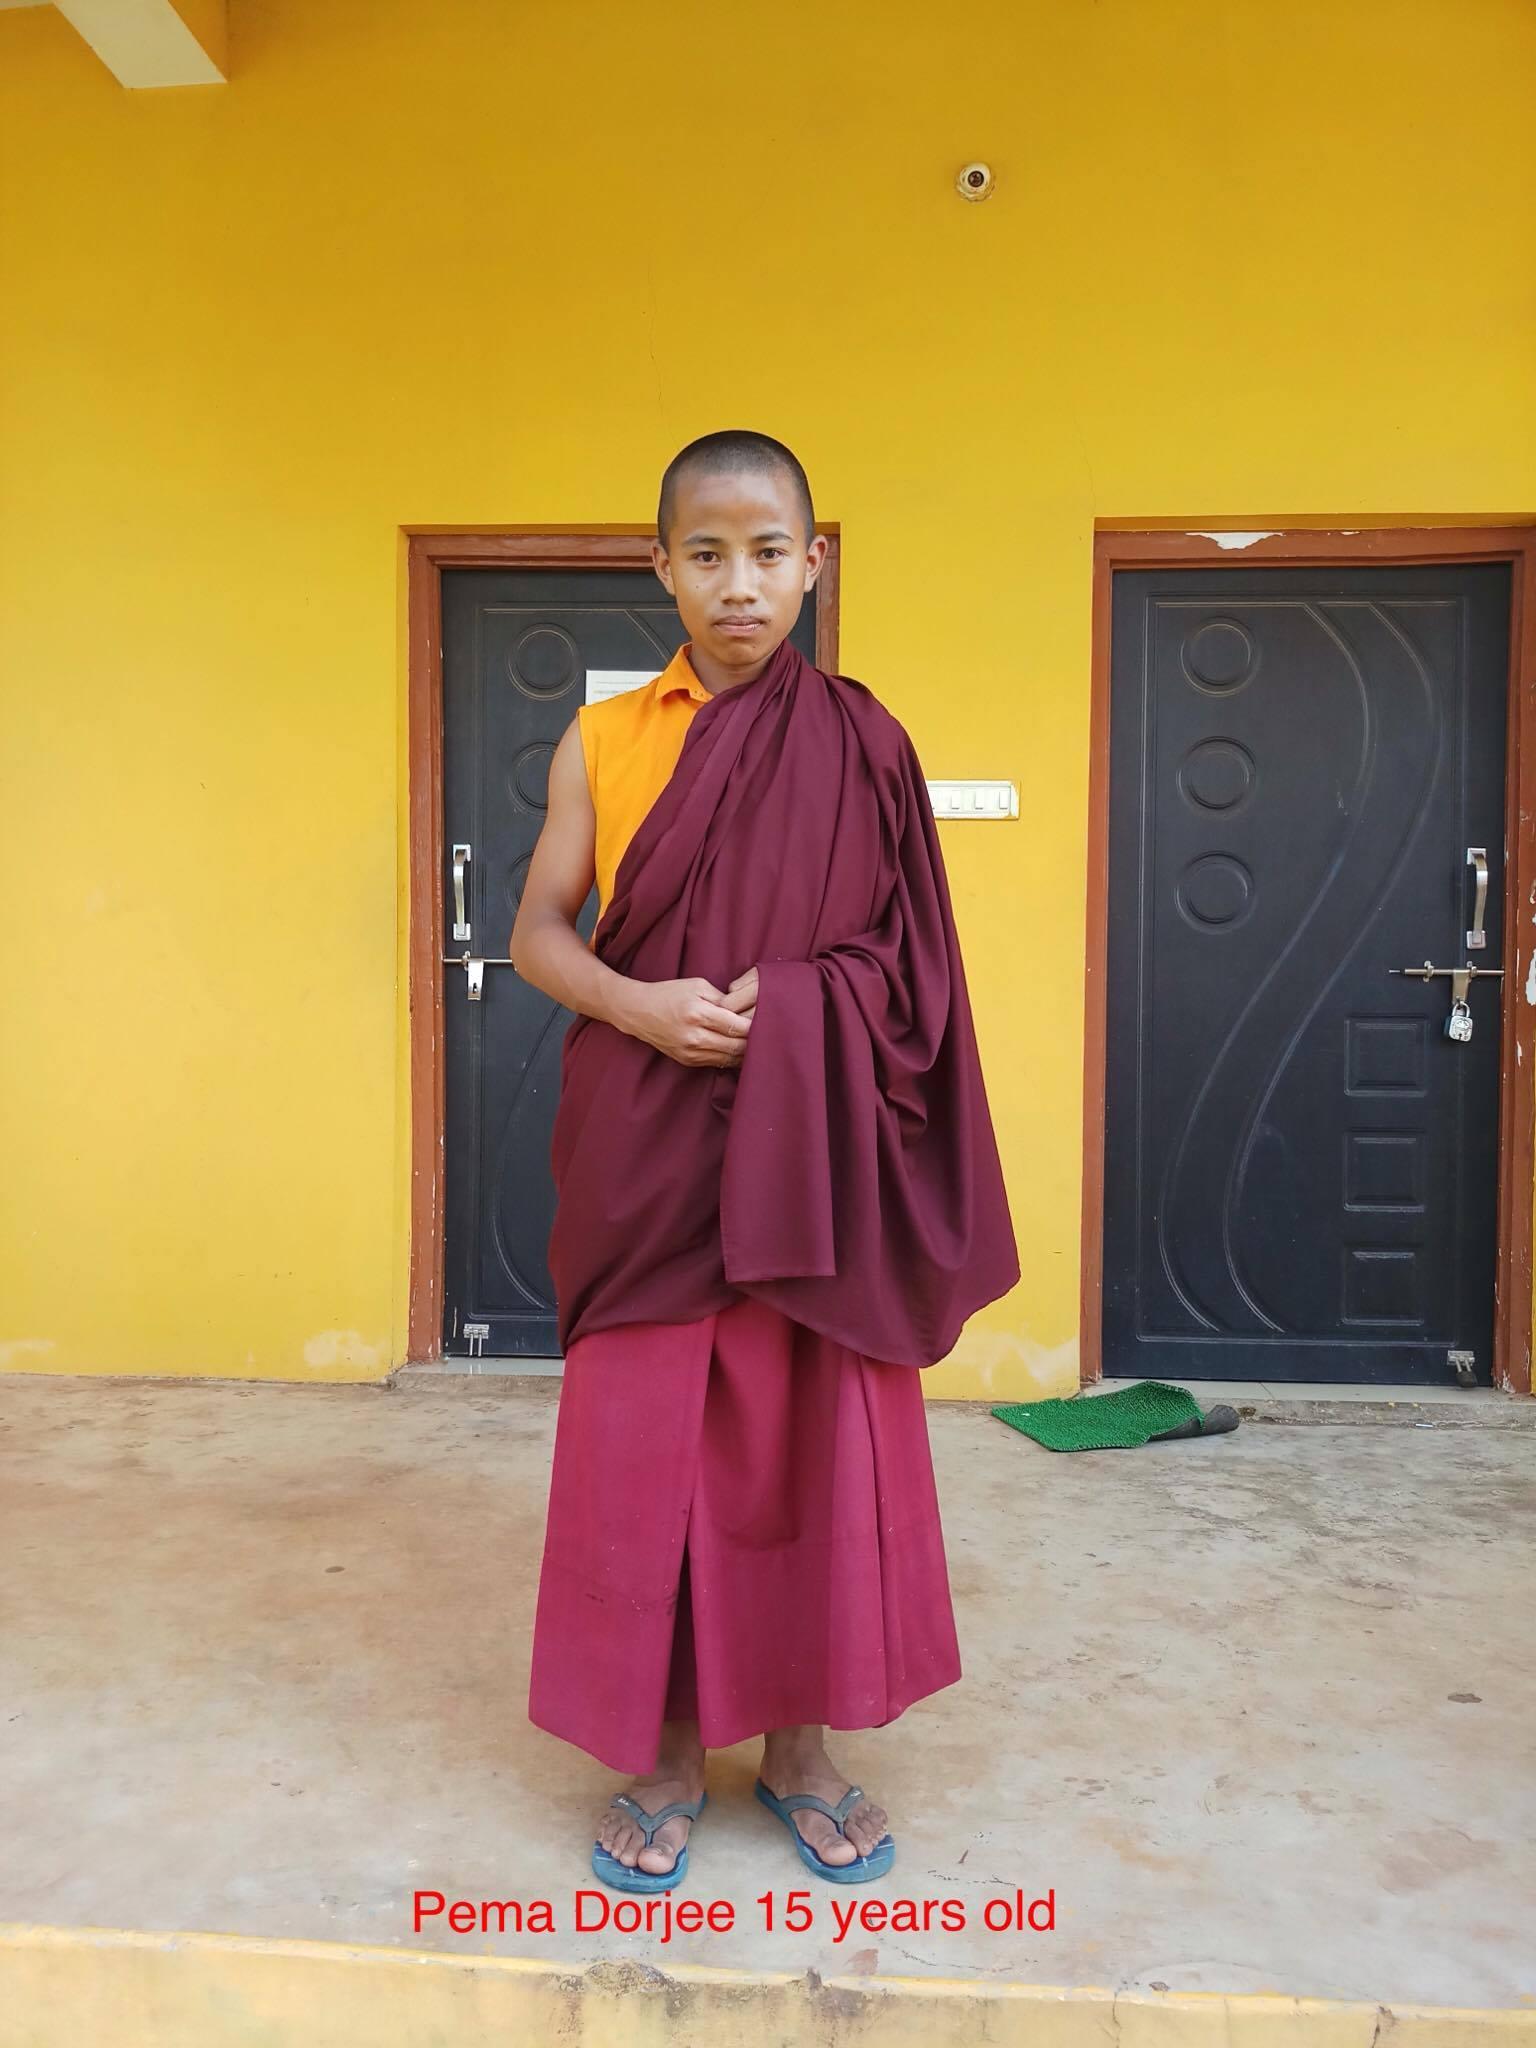 Monk_Pema_Dorjee_15yrs_old.jpg